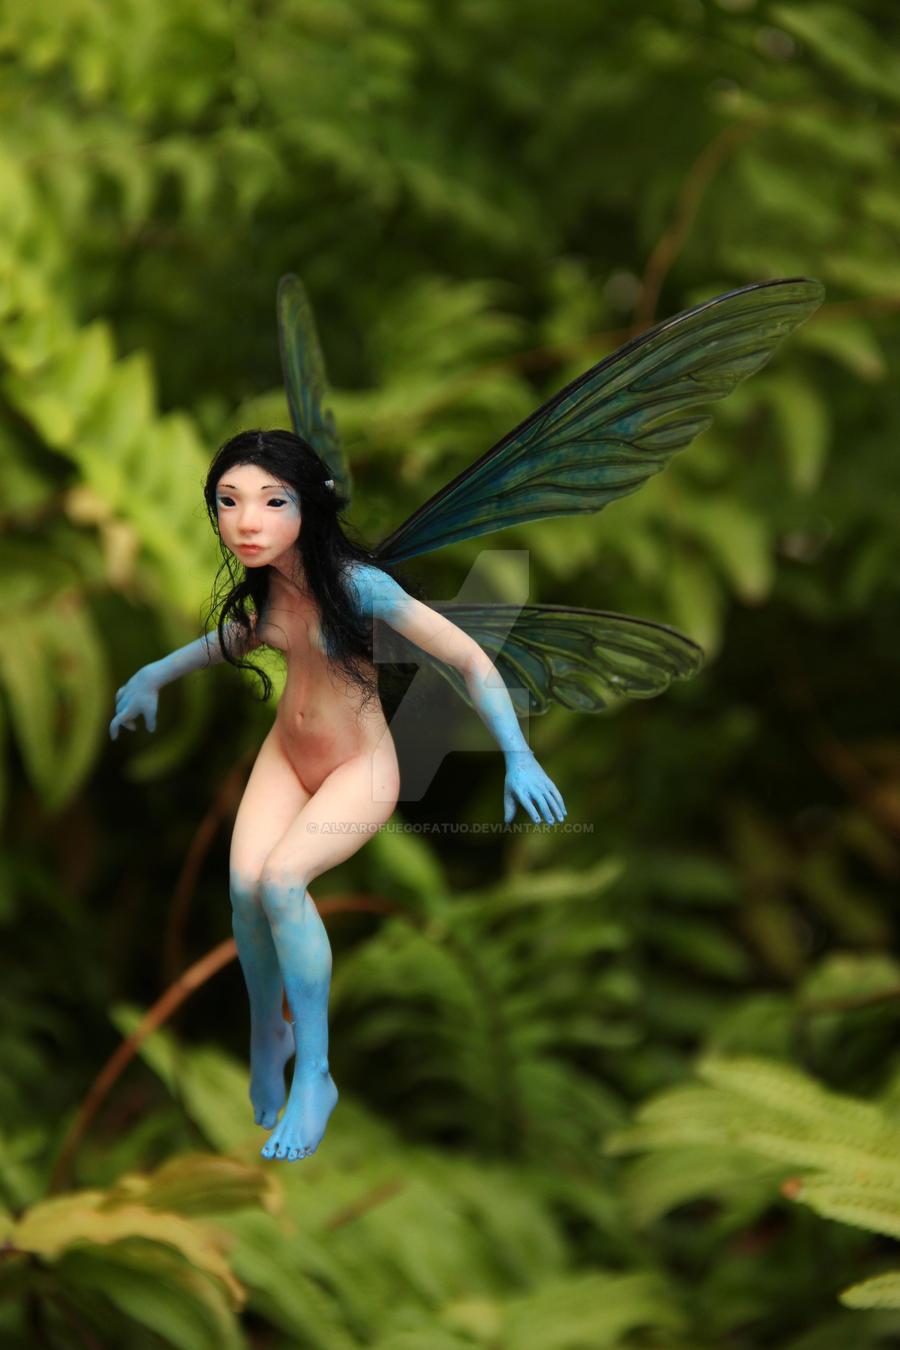 Blue faerie by AlvaroFuegoFatuo